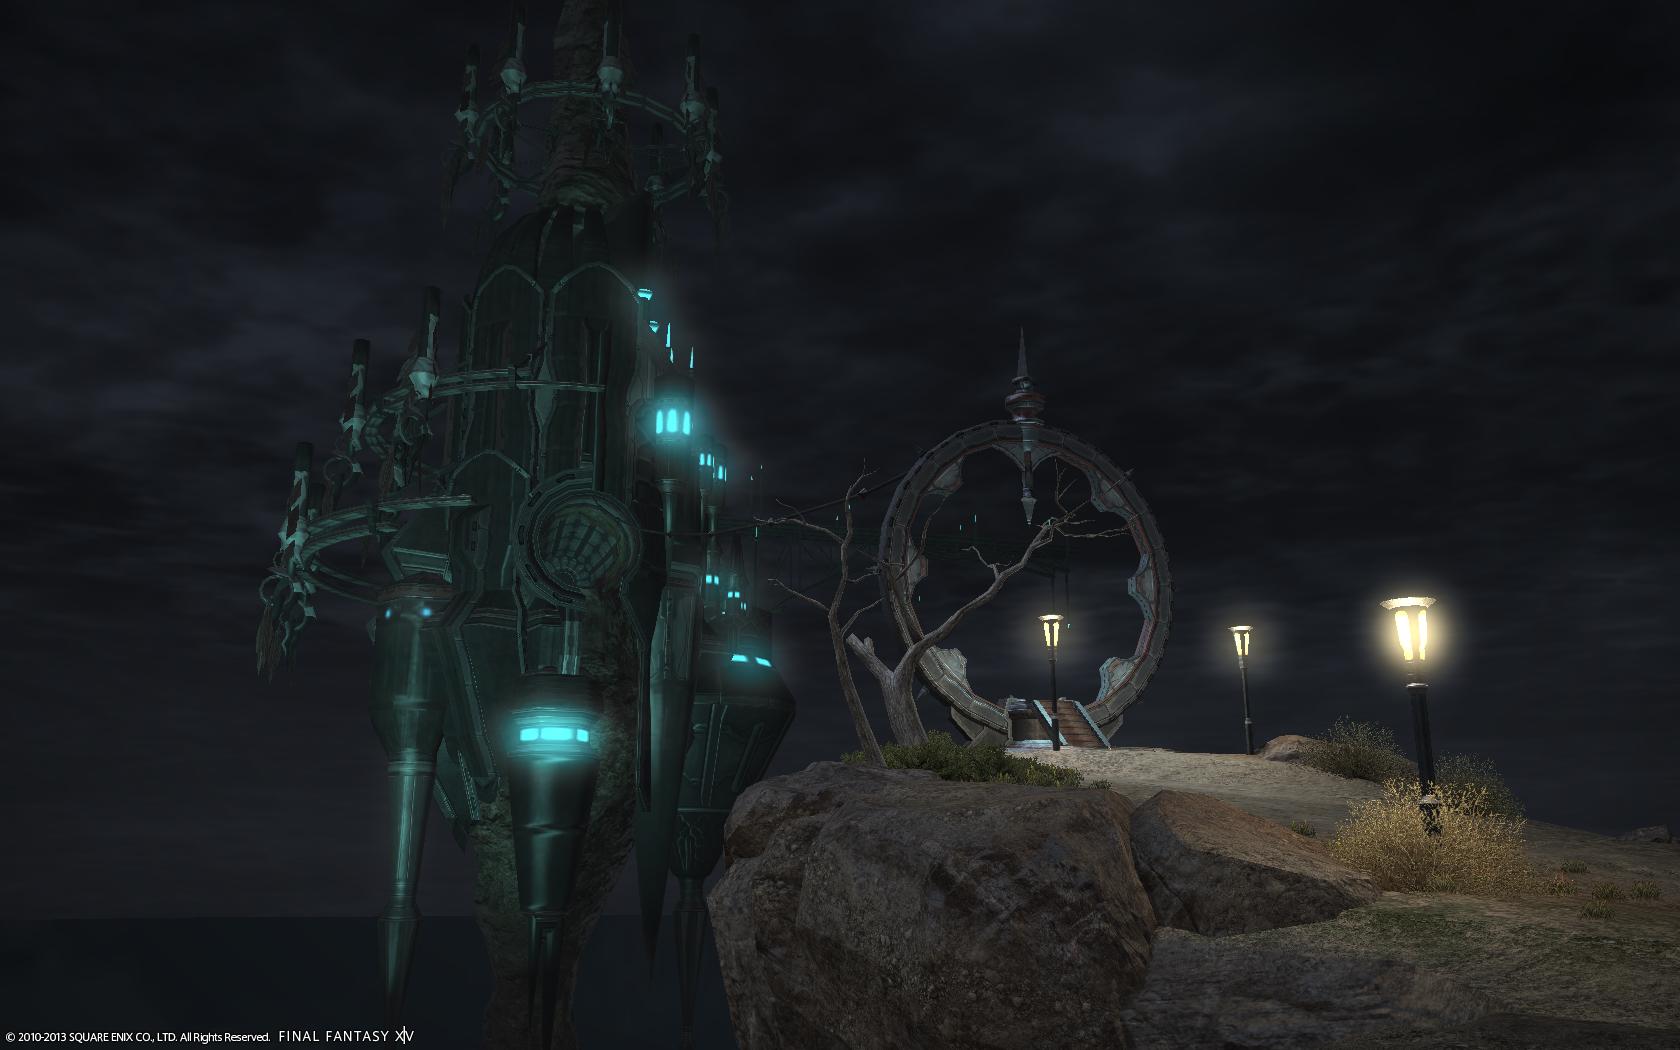 viena ffxiv limsa through tonight well screenshots lifted phase beta